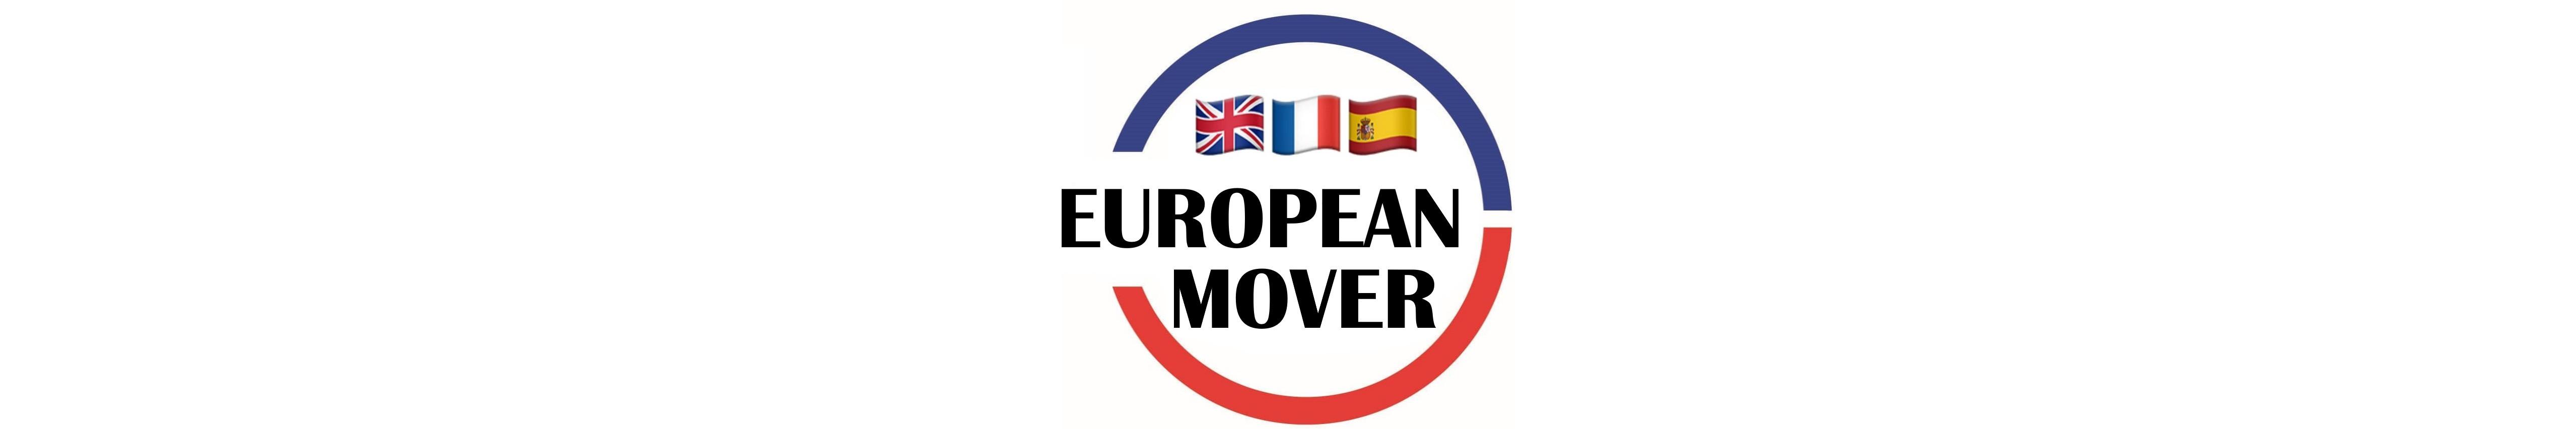 European Mover - Removal Services